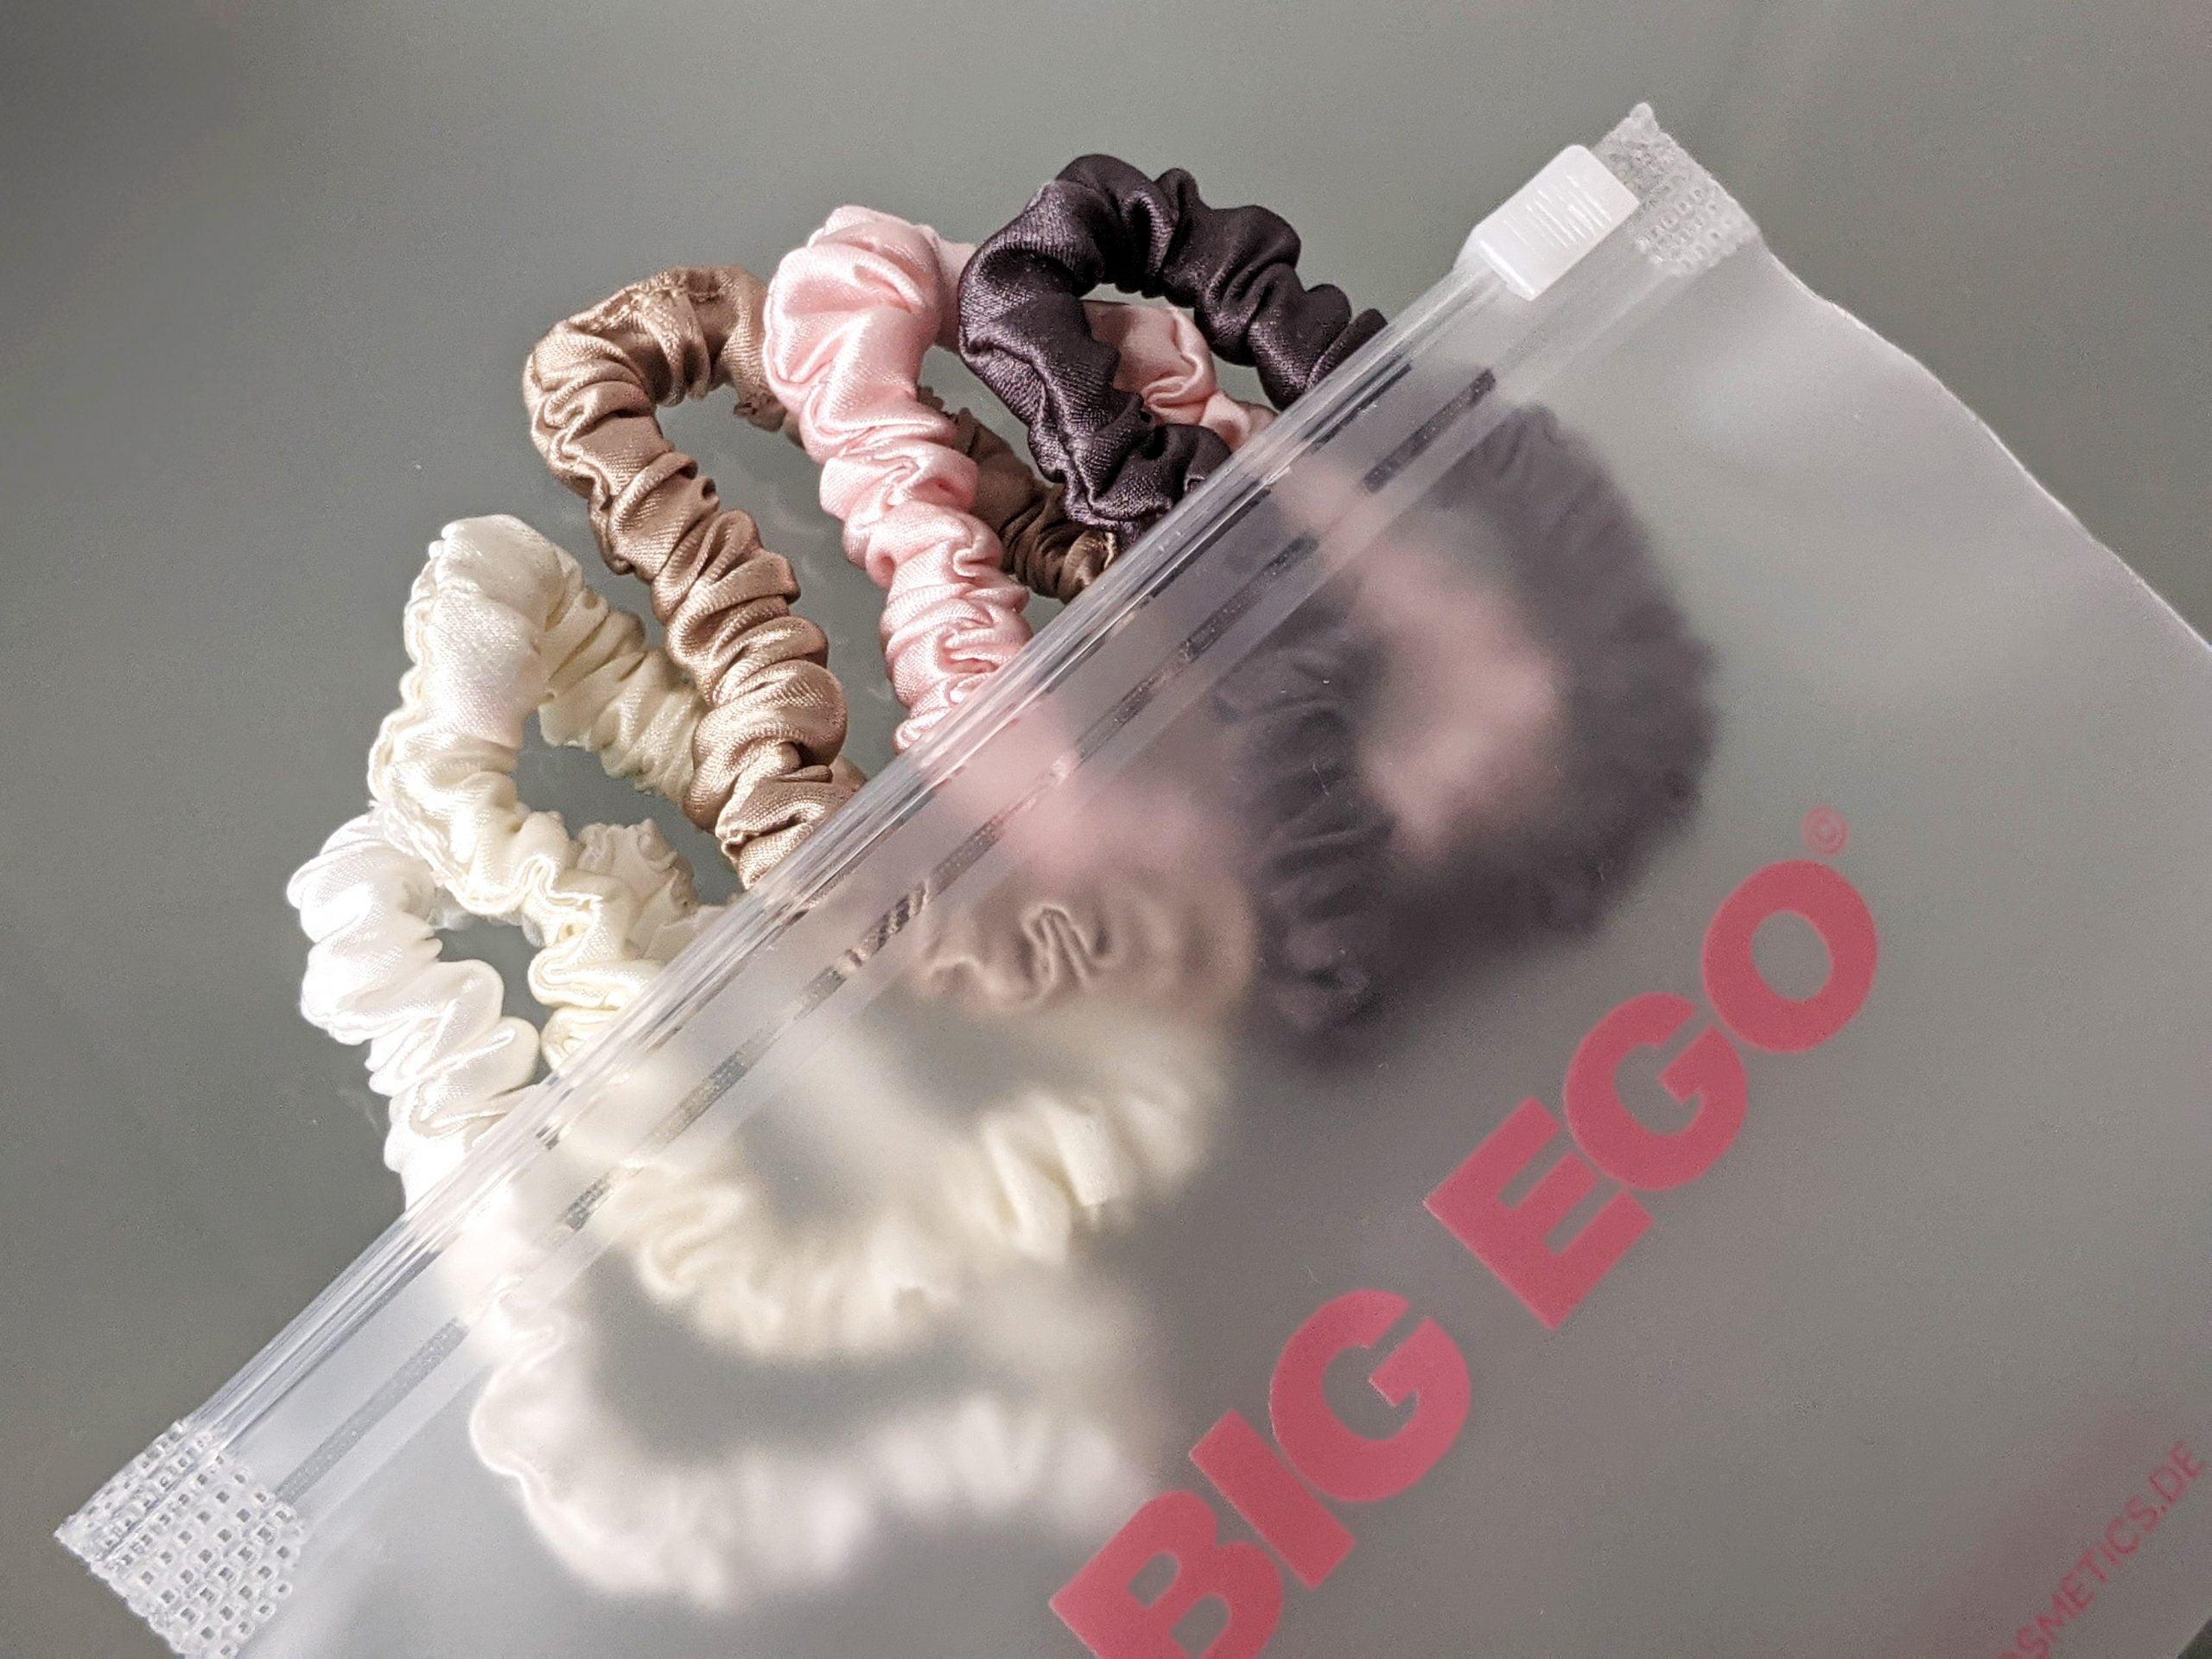 Big Ego Cosmetics